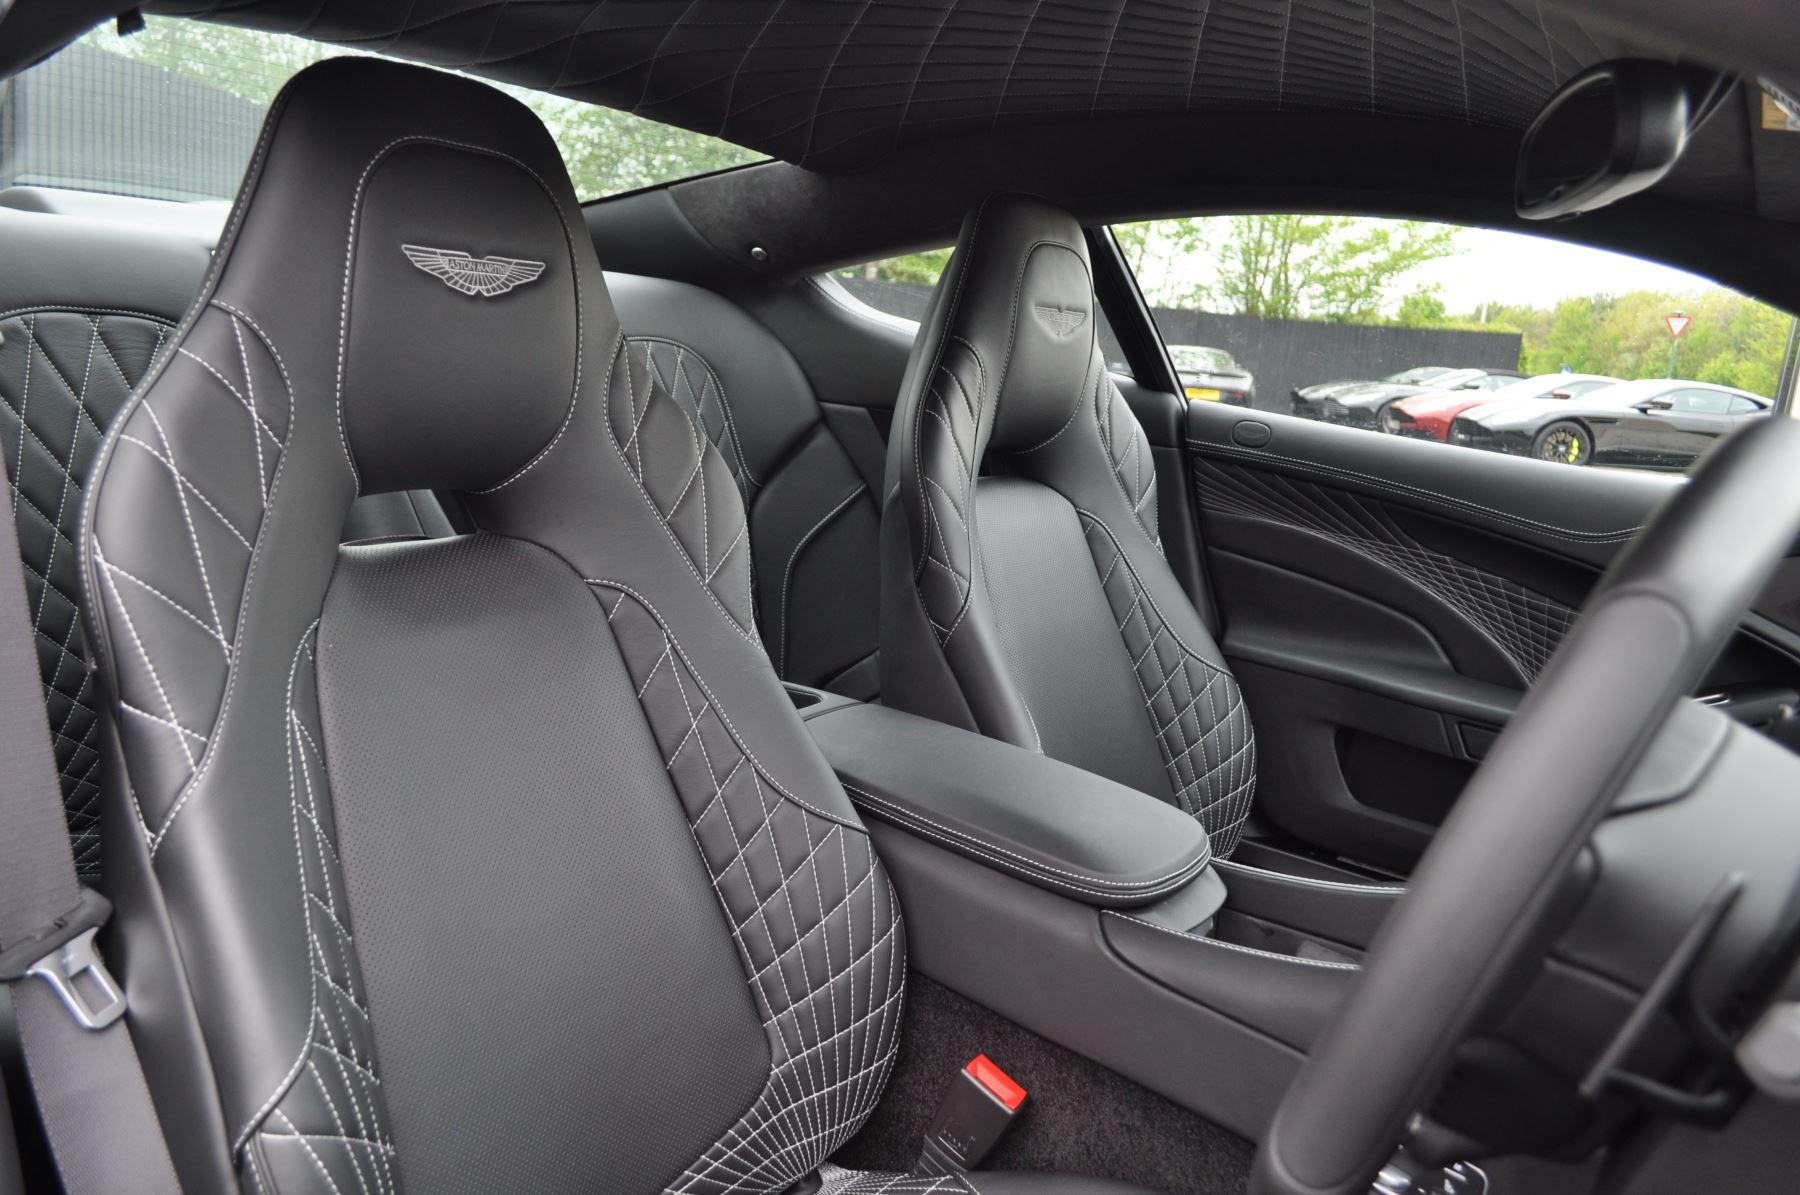 Aston Martin Vanquish S V12 [595] S 2+2 2dr Touchtronic image 27